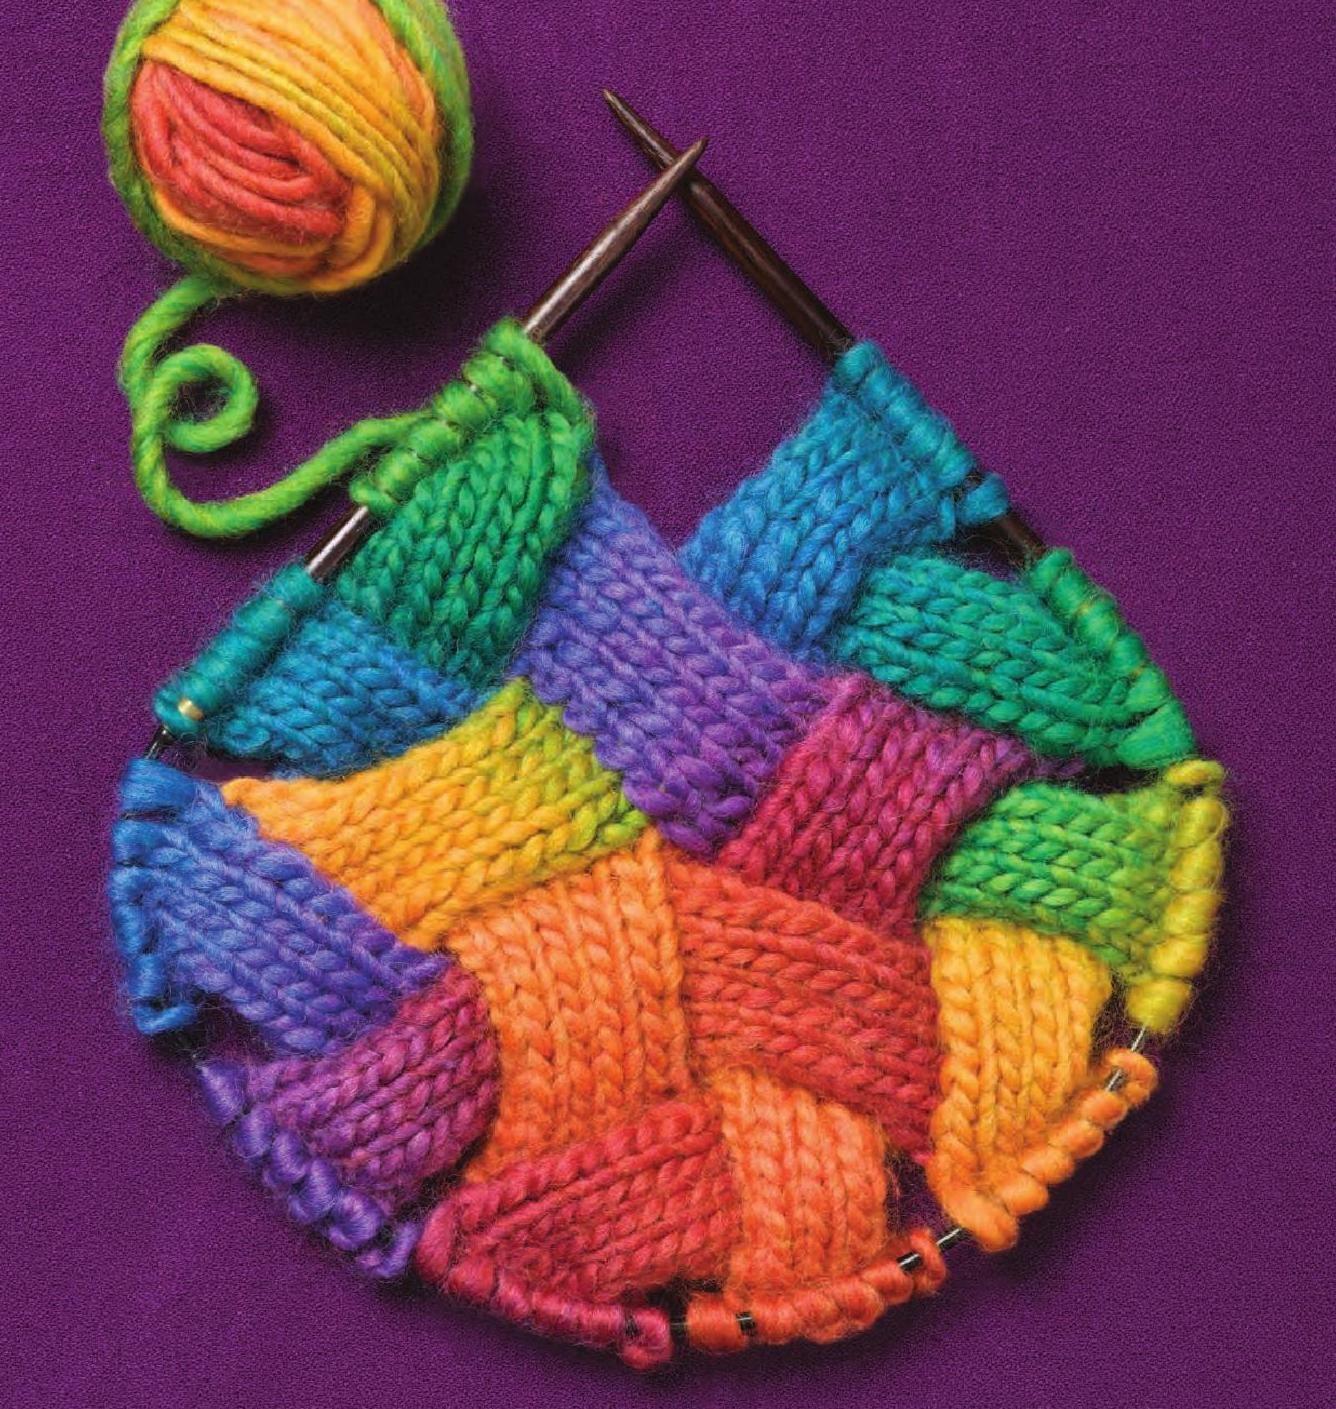 Entrelac 2 | Knit crochet, Knit hats and Crochet